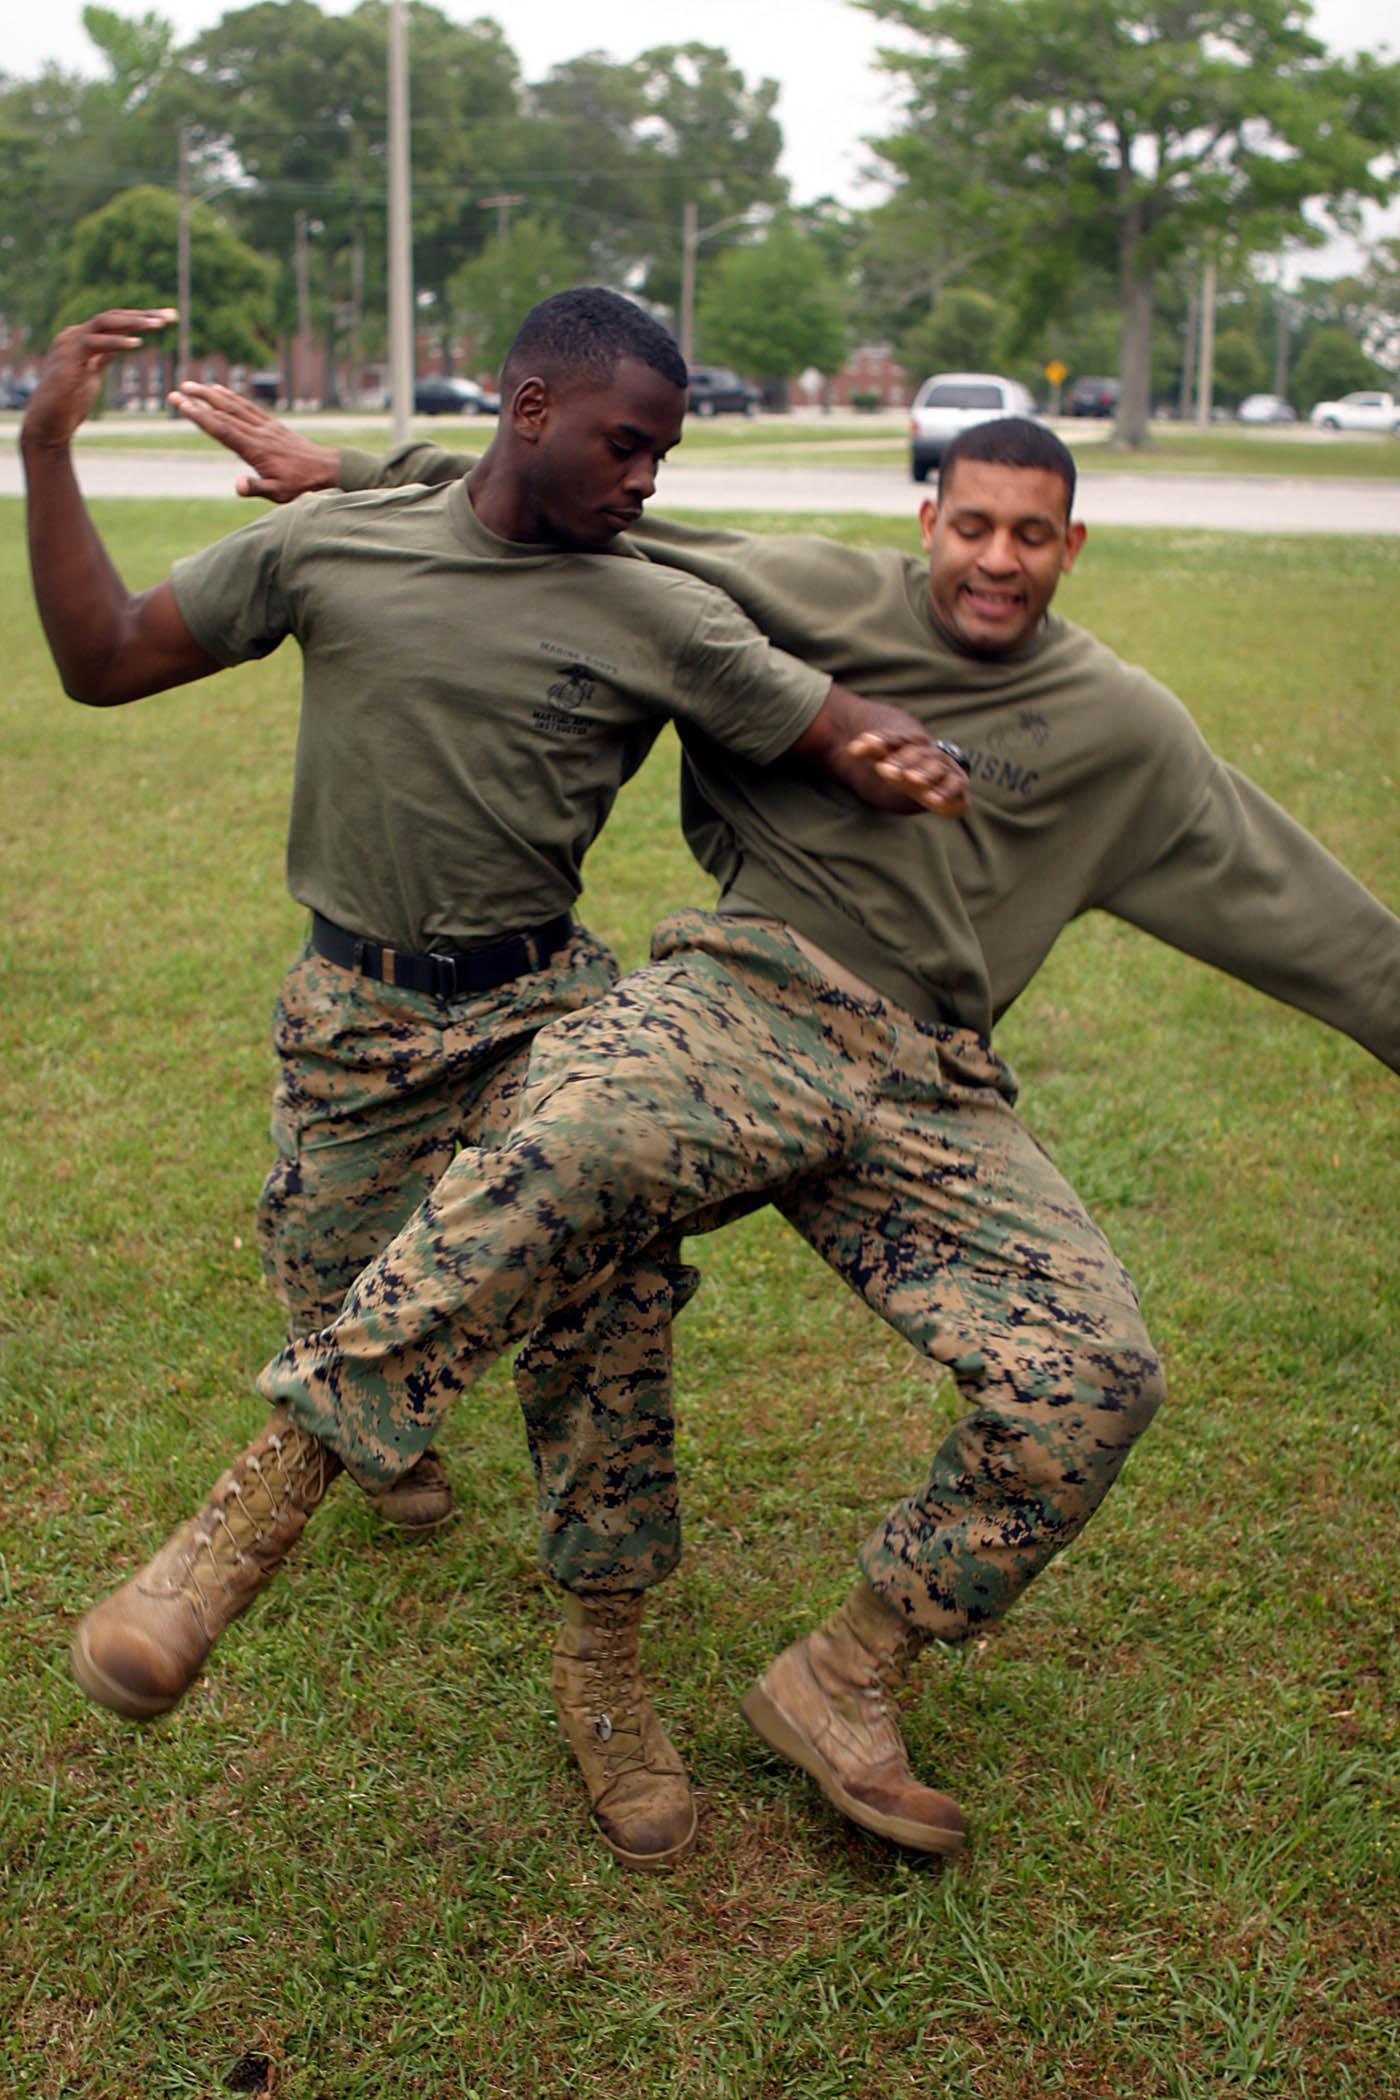 Combate Corpo A Corpo Wikip 233 Dia A Enciclop 233 Dia Livre